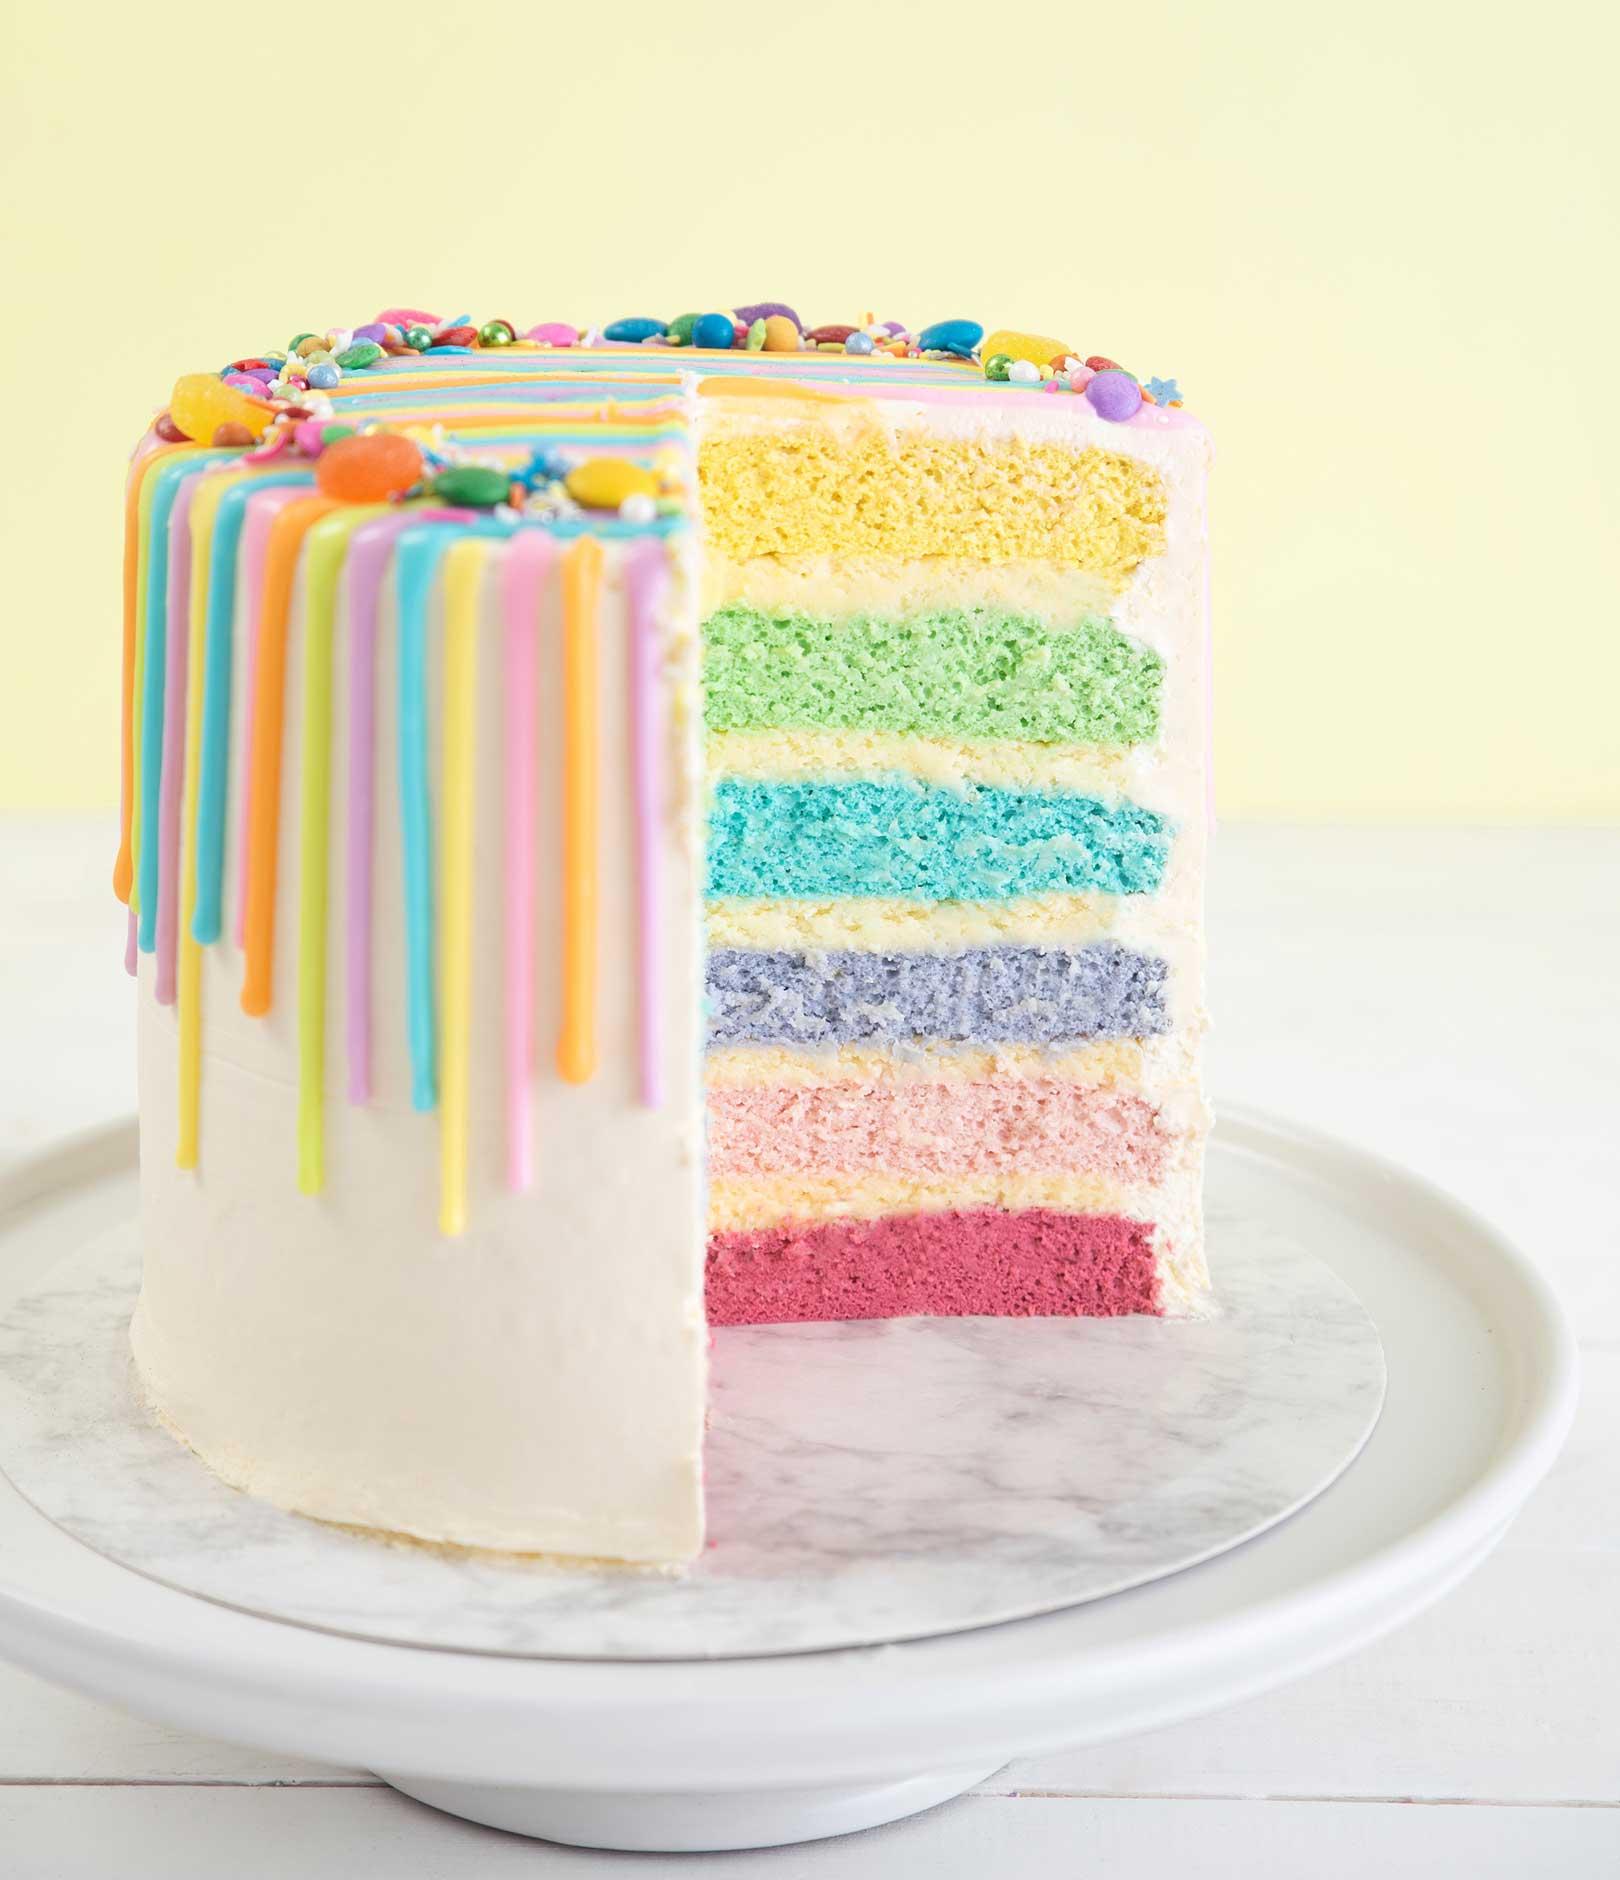 Velvet-Drip-Cake-1620x1880px-Pastel